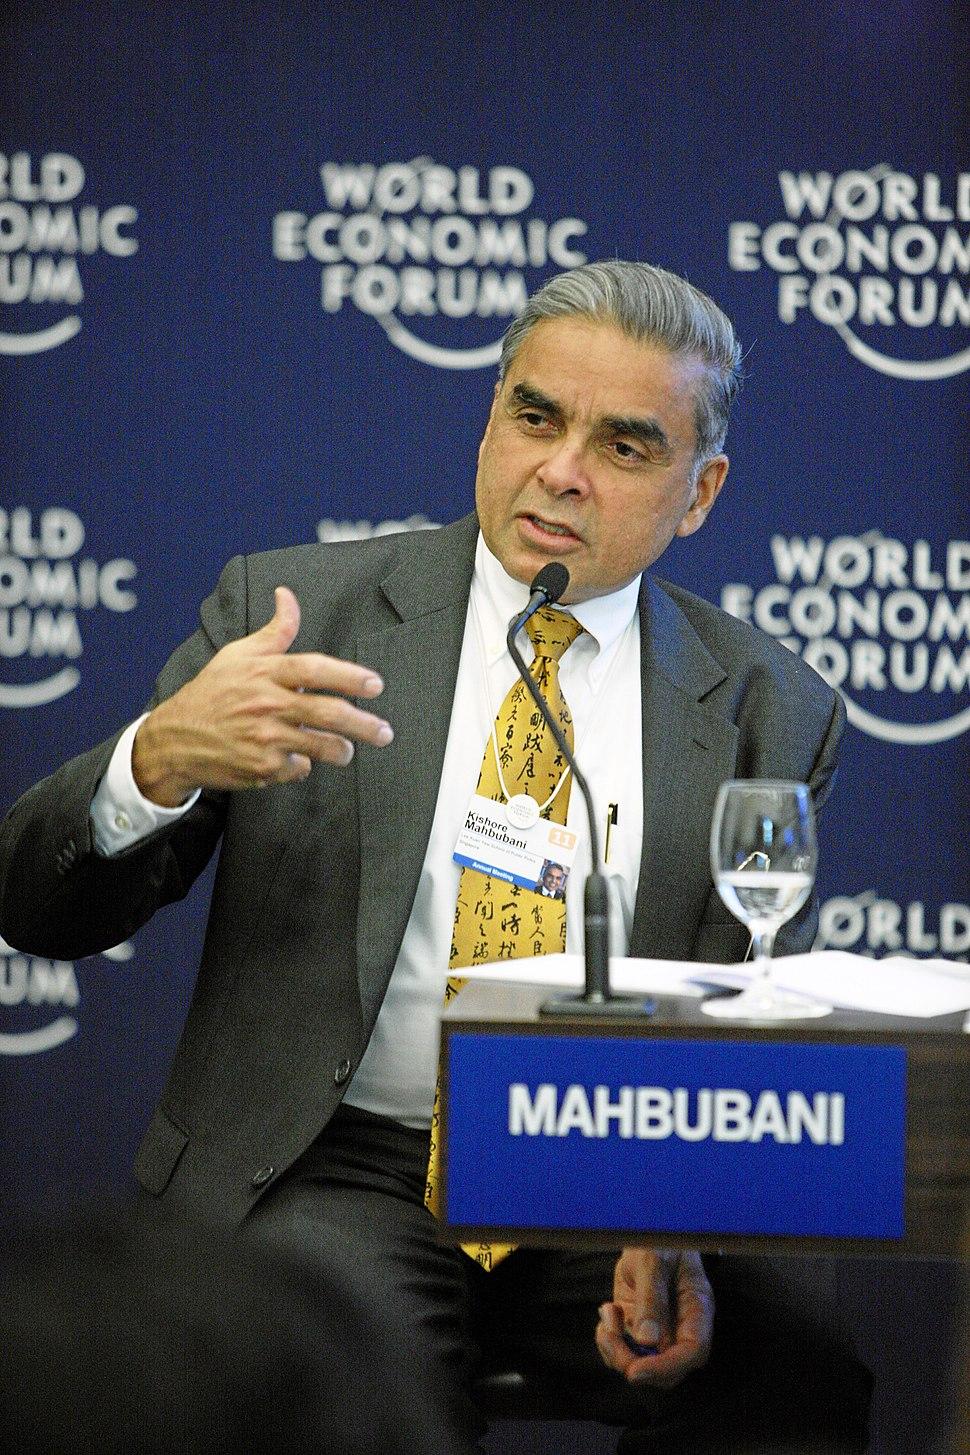 Kishore Mahbubani - World Economic Forum Annual Meeting 2011